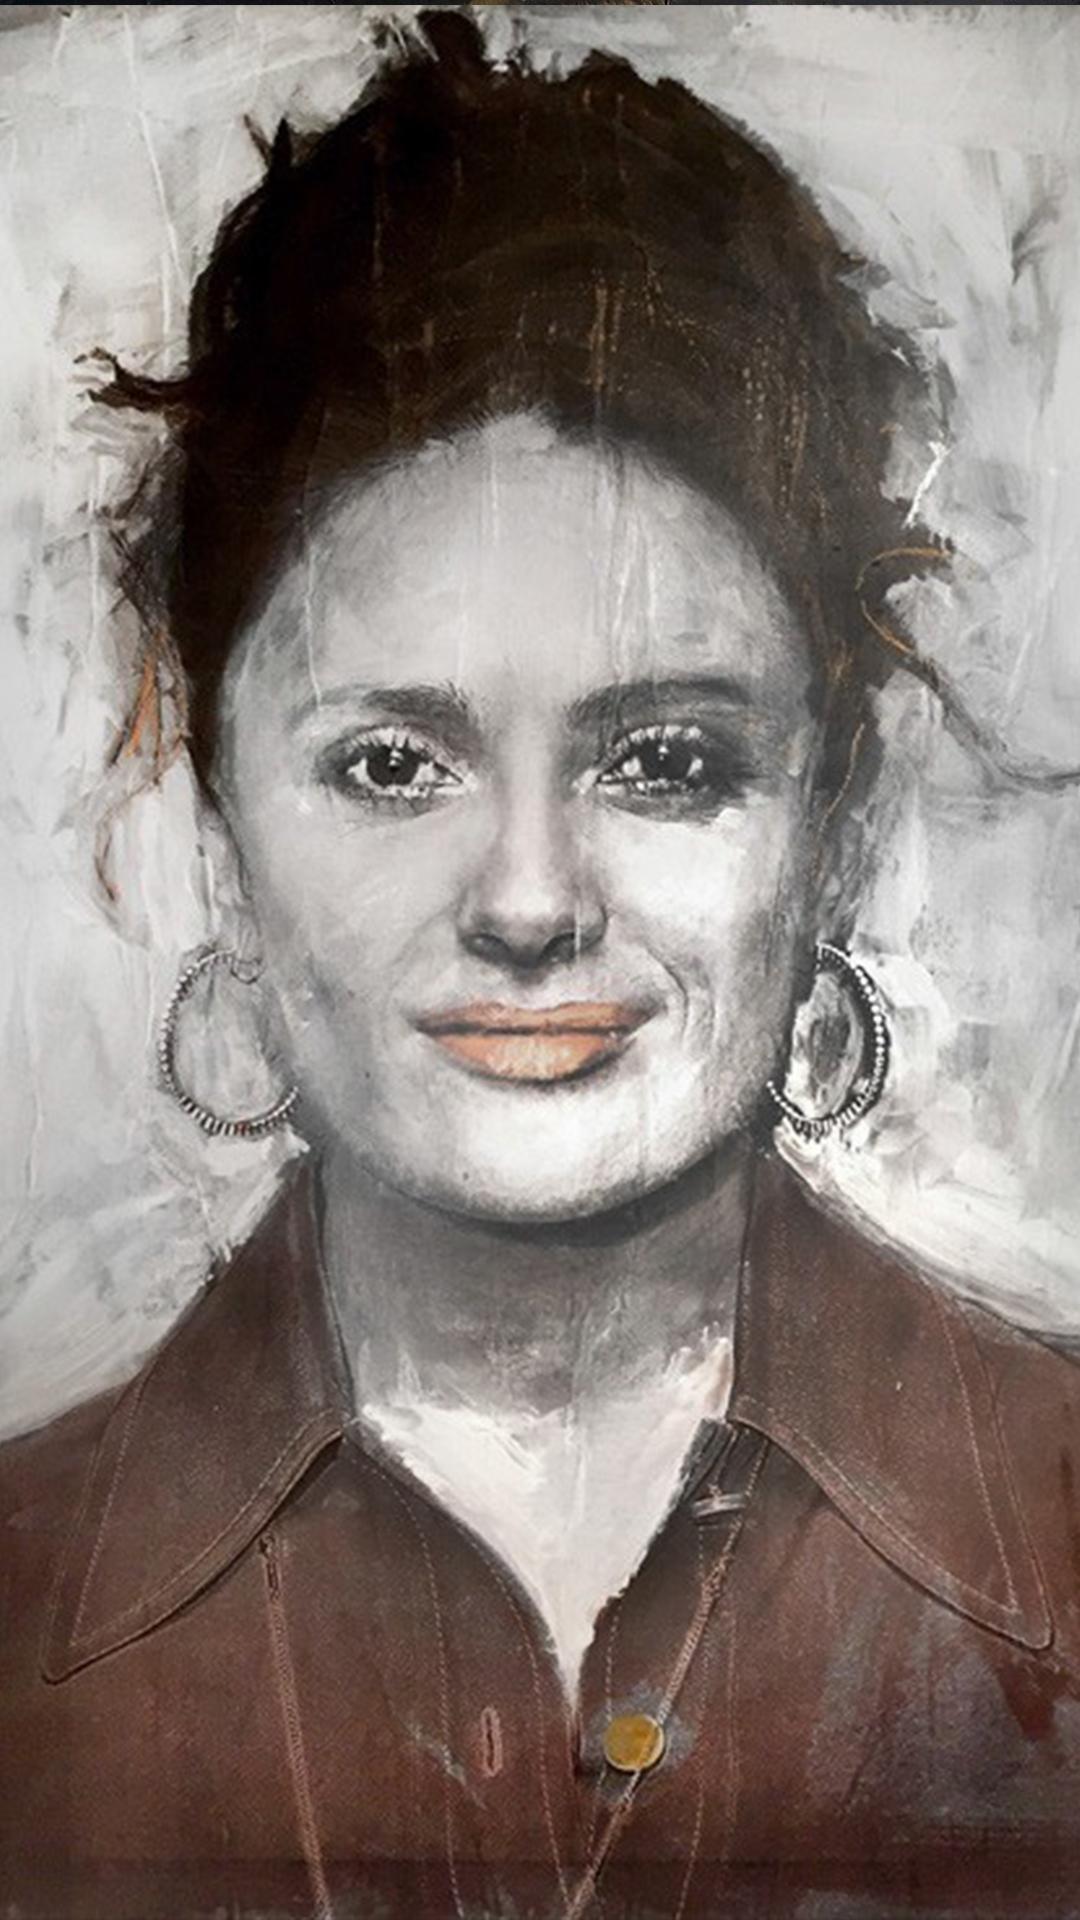 Salma Hayek tec mista  100X130 cm $45..000